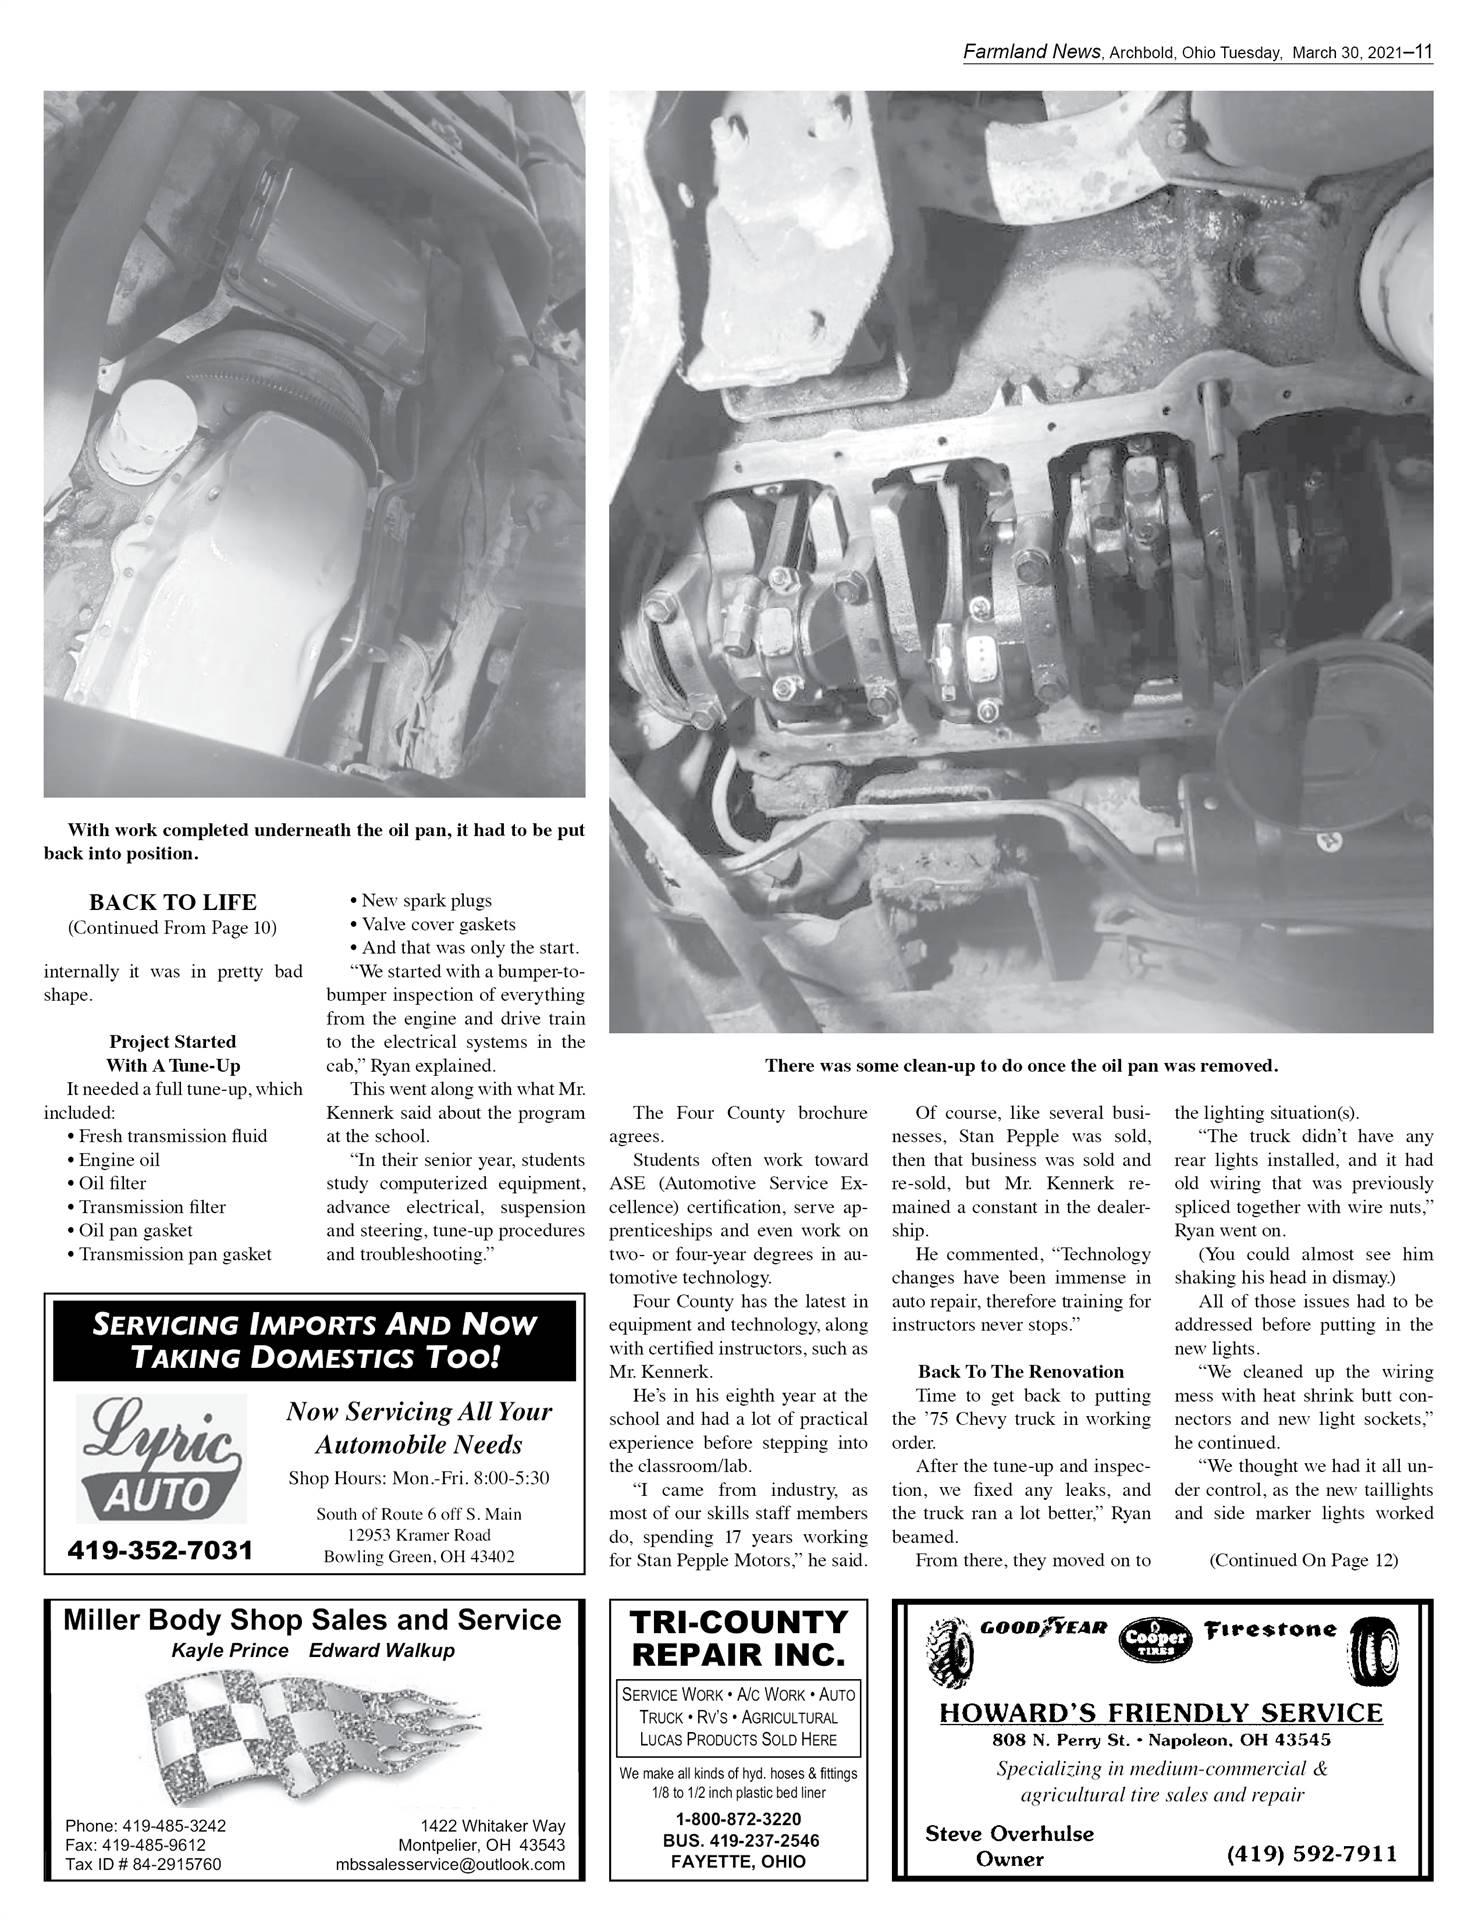 Farmland News Story - Page 3